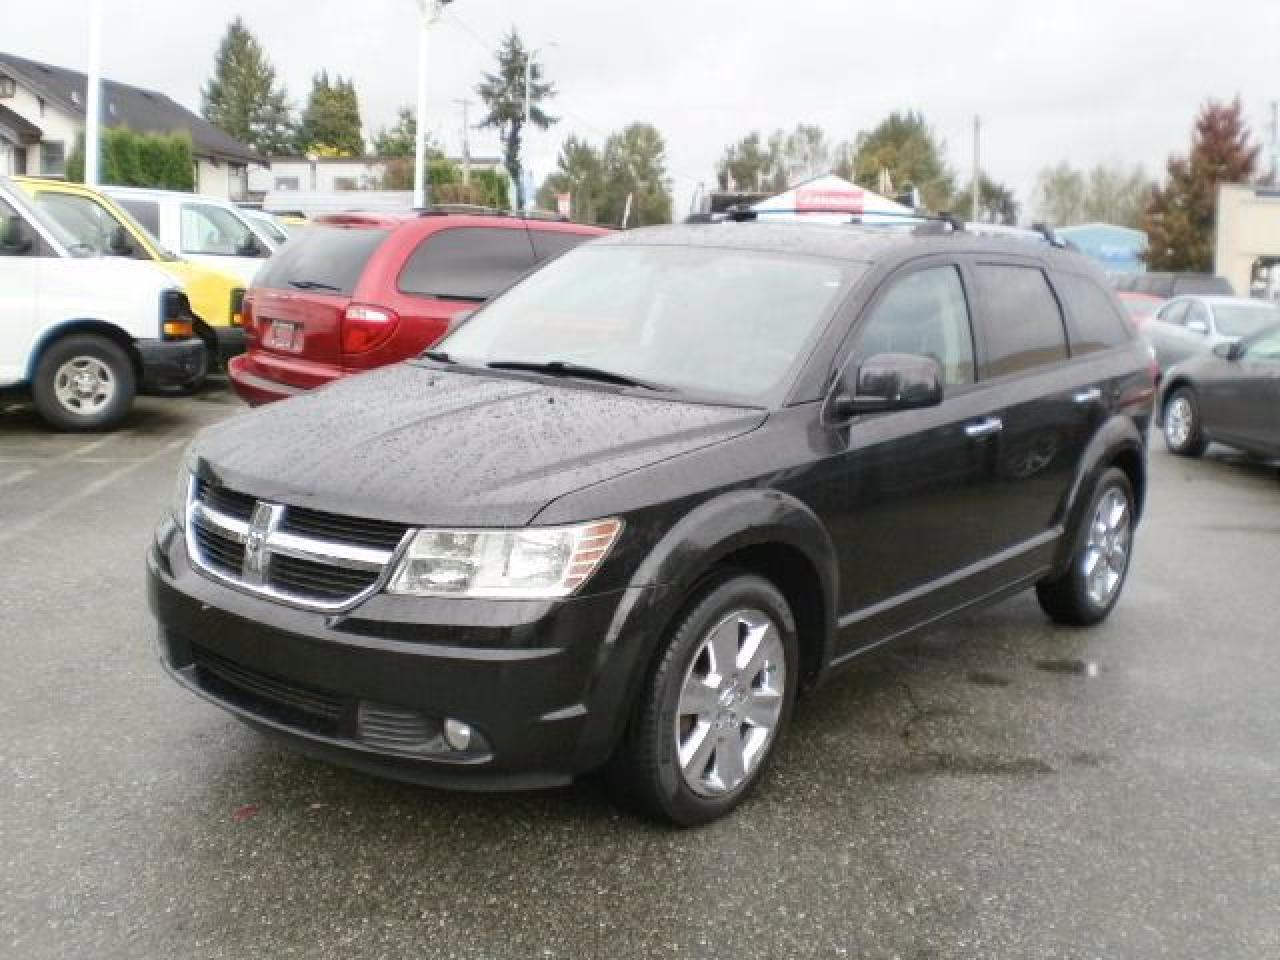 2010 Dodge Journey R/T, leather, sunroof, navigation,